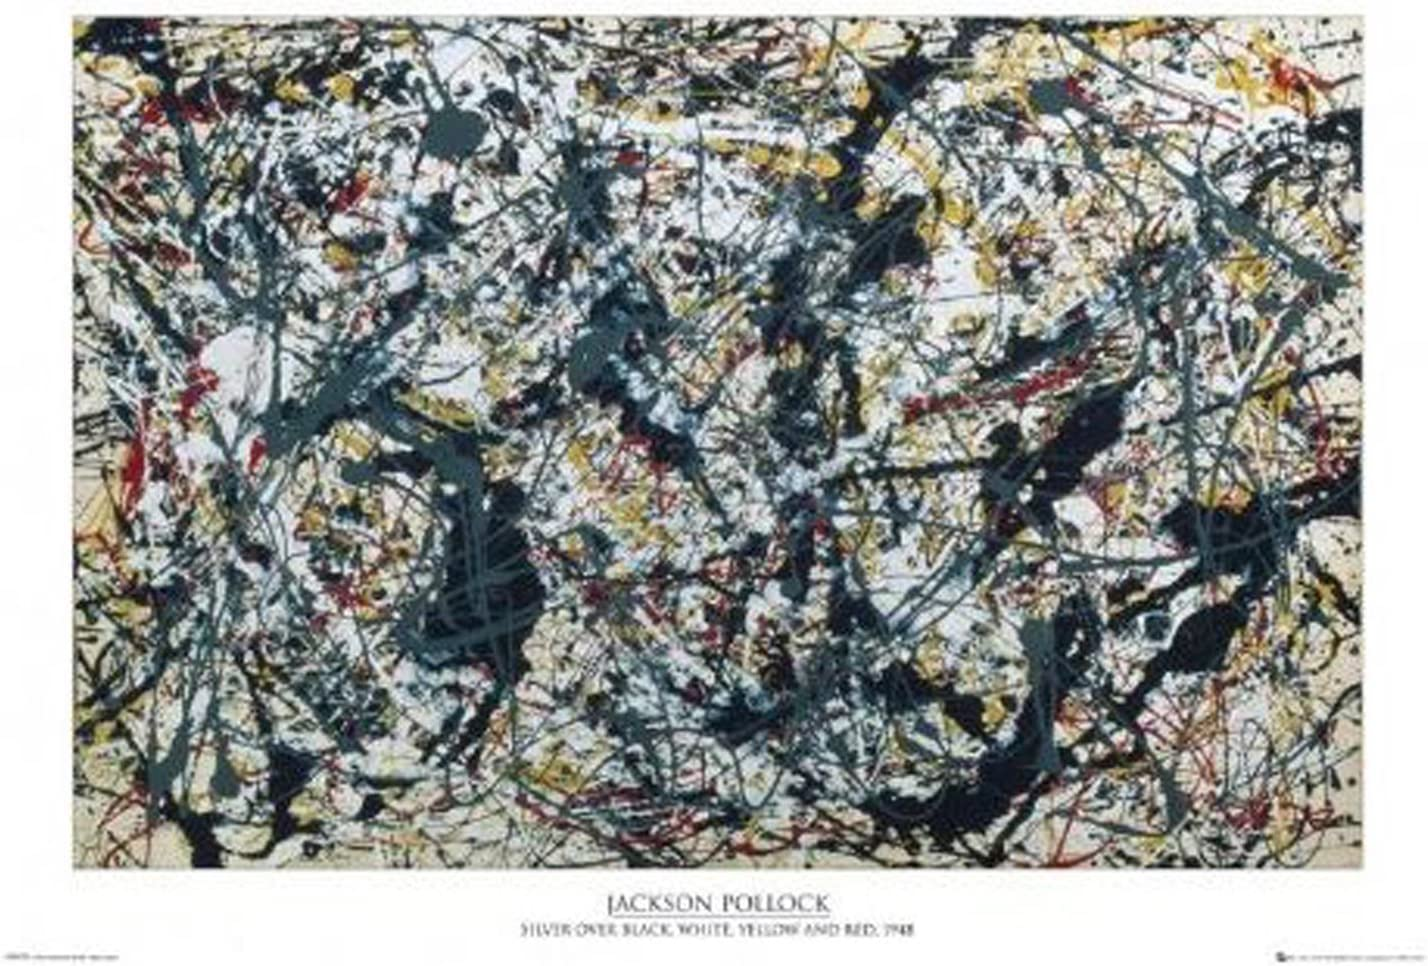 1.6 ft x 2.6 ft = 4.1 Square ft Rug Doormat Waterproof Plush Living Kitchen Jackson Pollock